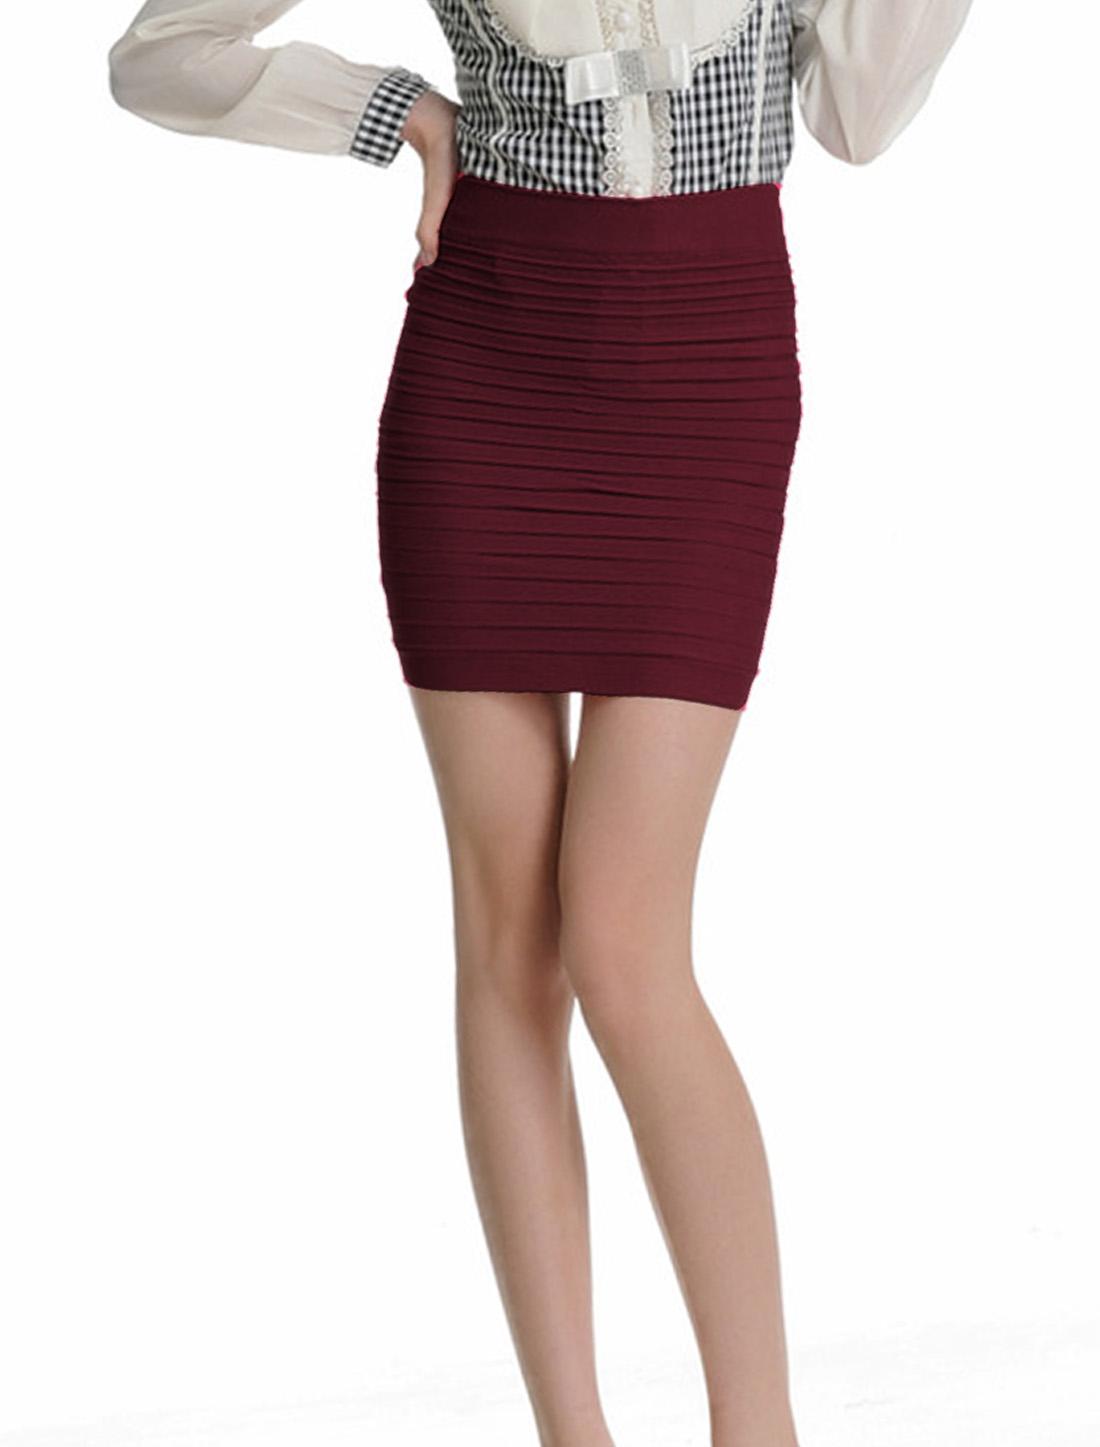 Women Burgundy Layered Design Stretchy Summer Mini Skirt XS